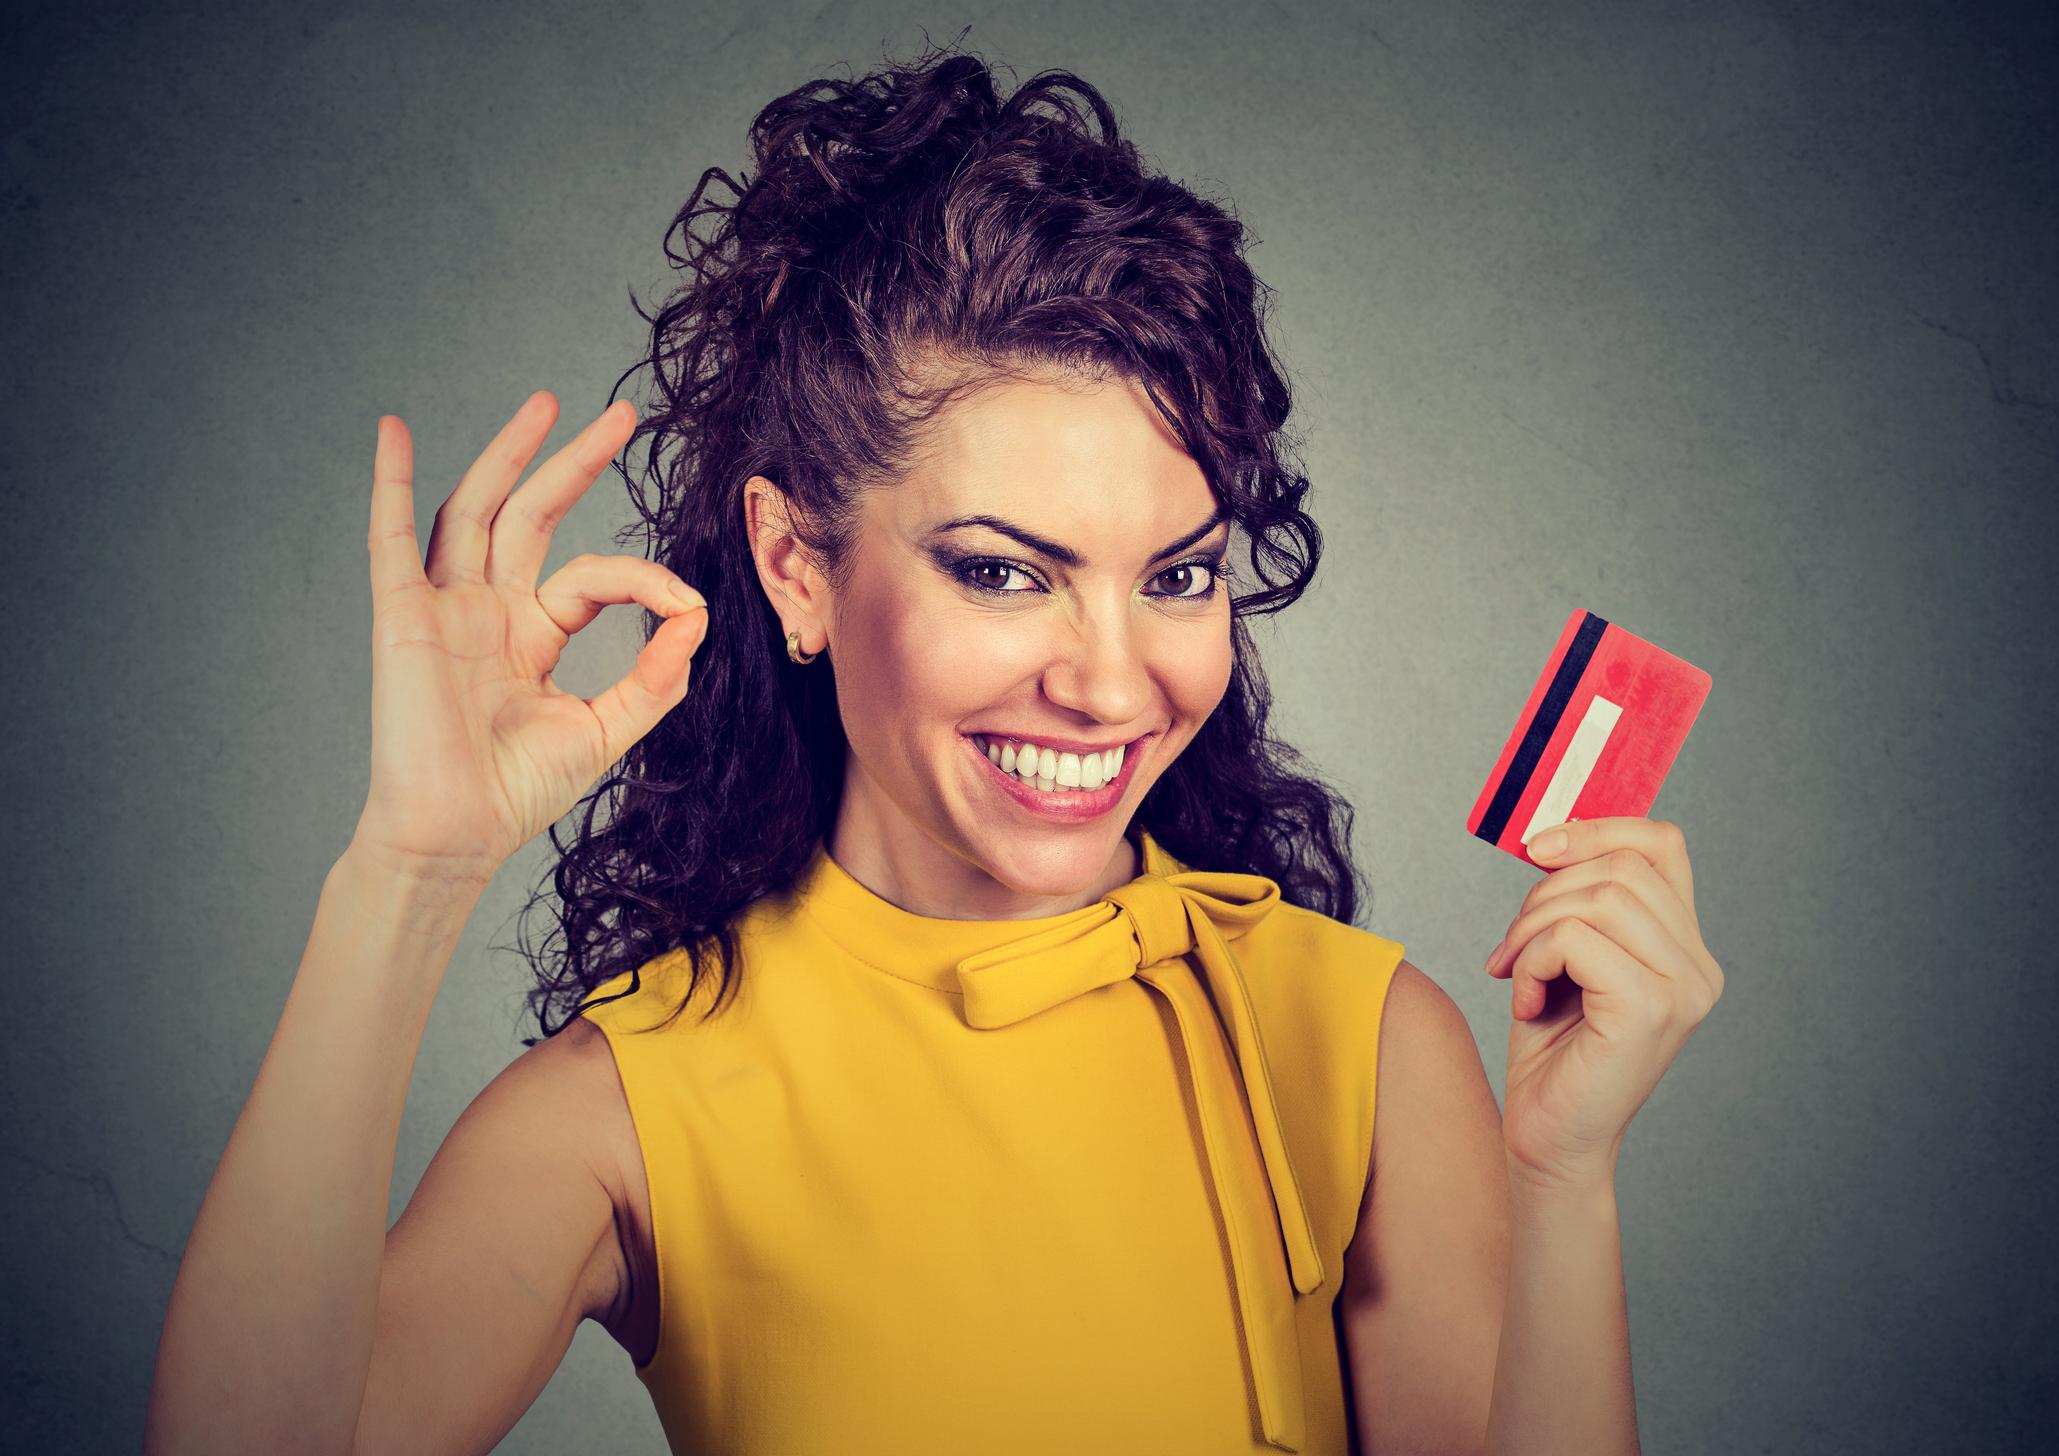 best cash back credit cards miles reward APR interest rate